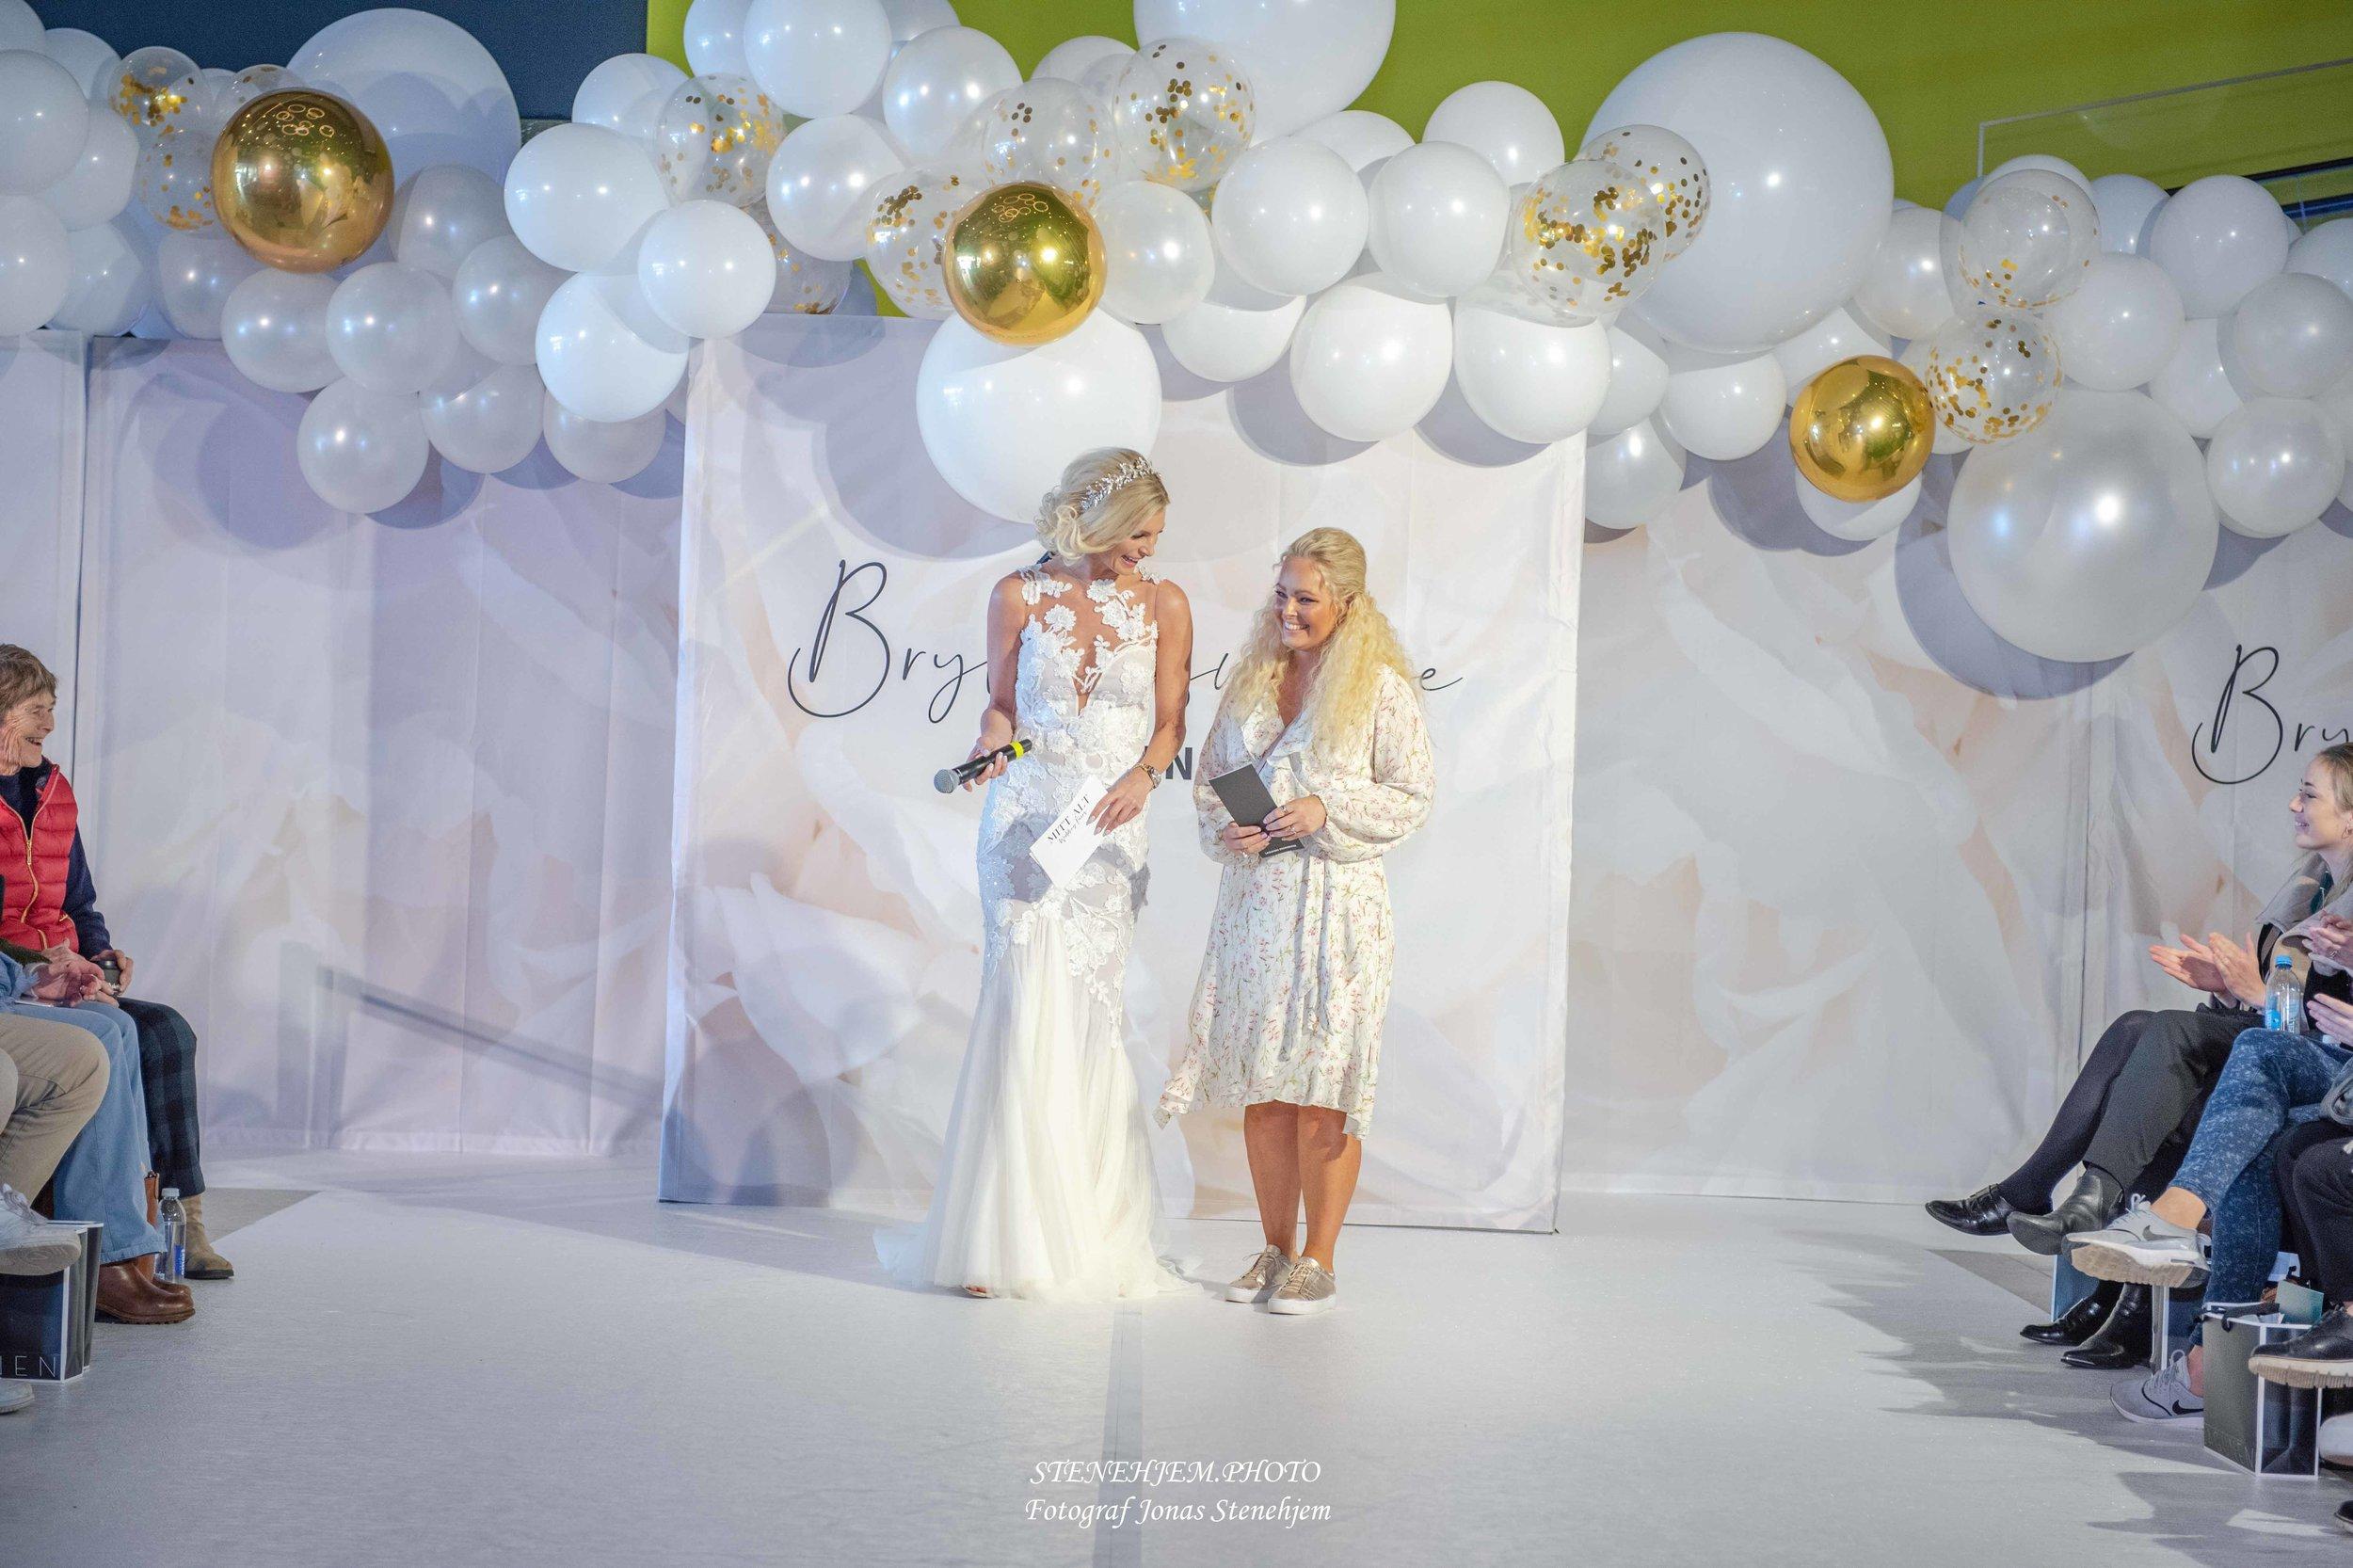 Bryllupsmesse_Lagunen_mittaltweddingfair__028.jpg